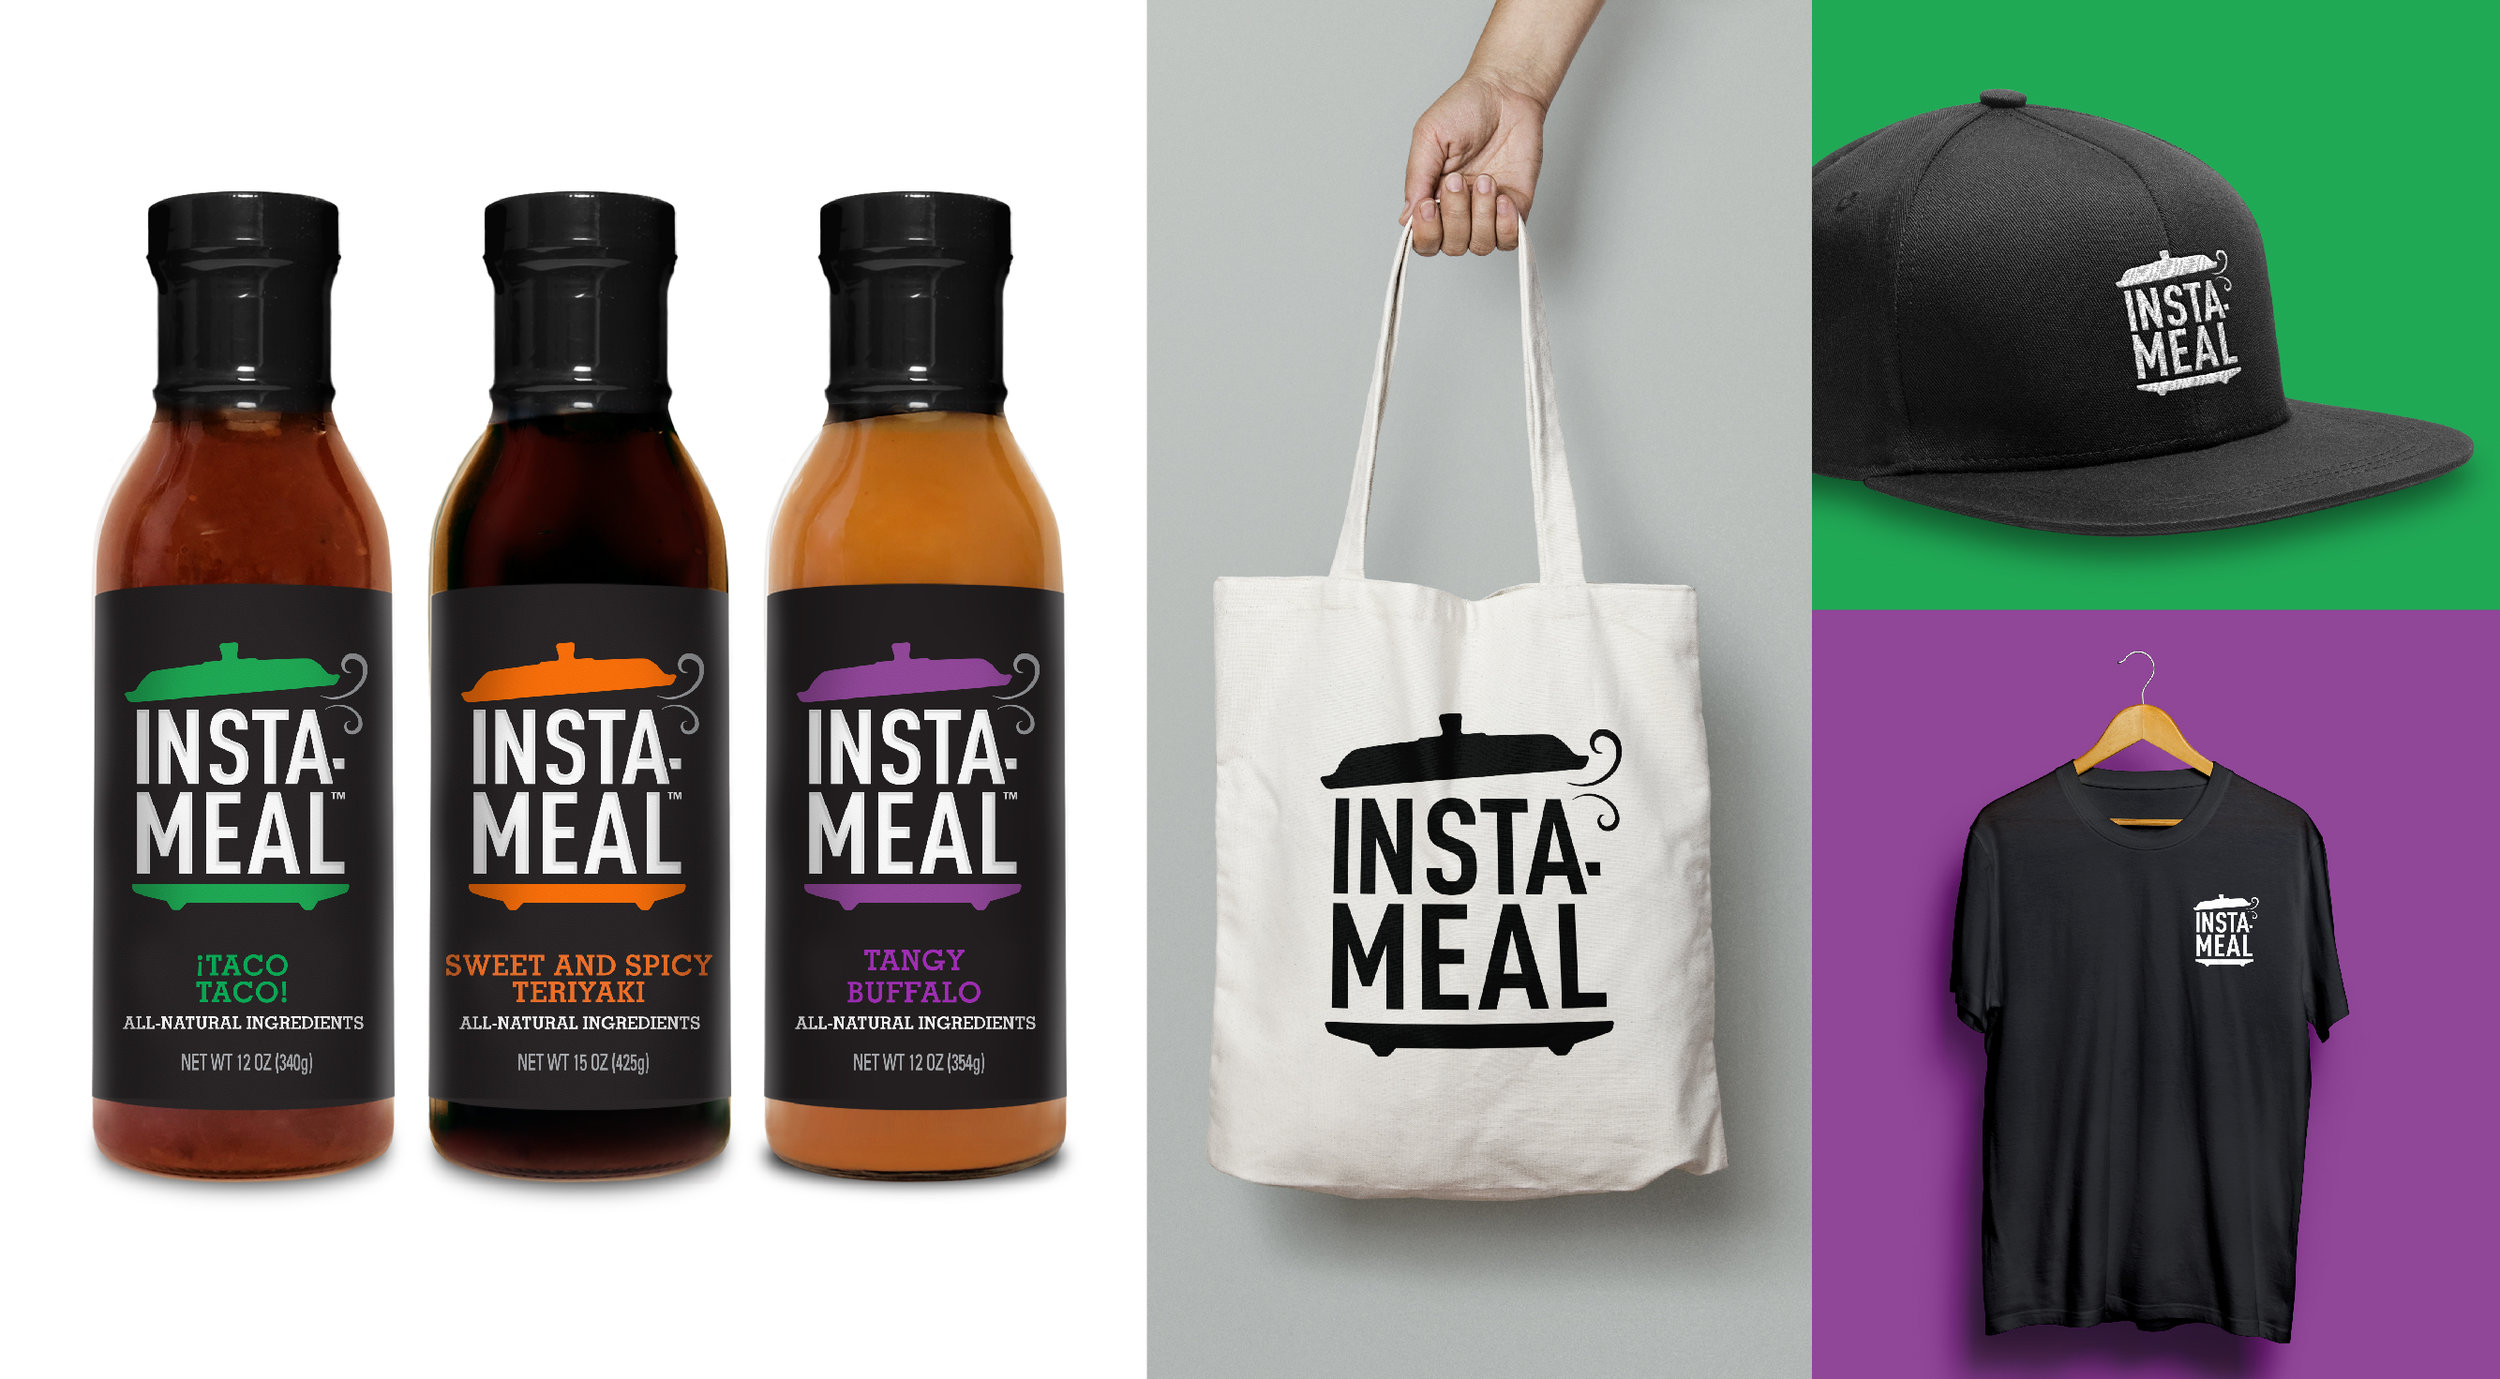 SDP_Insta-Meal_1.jpg